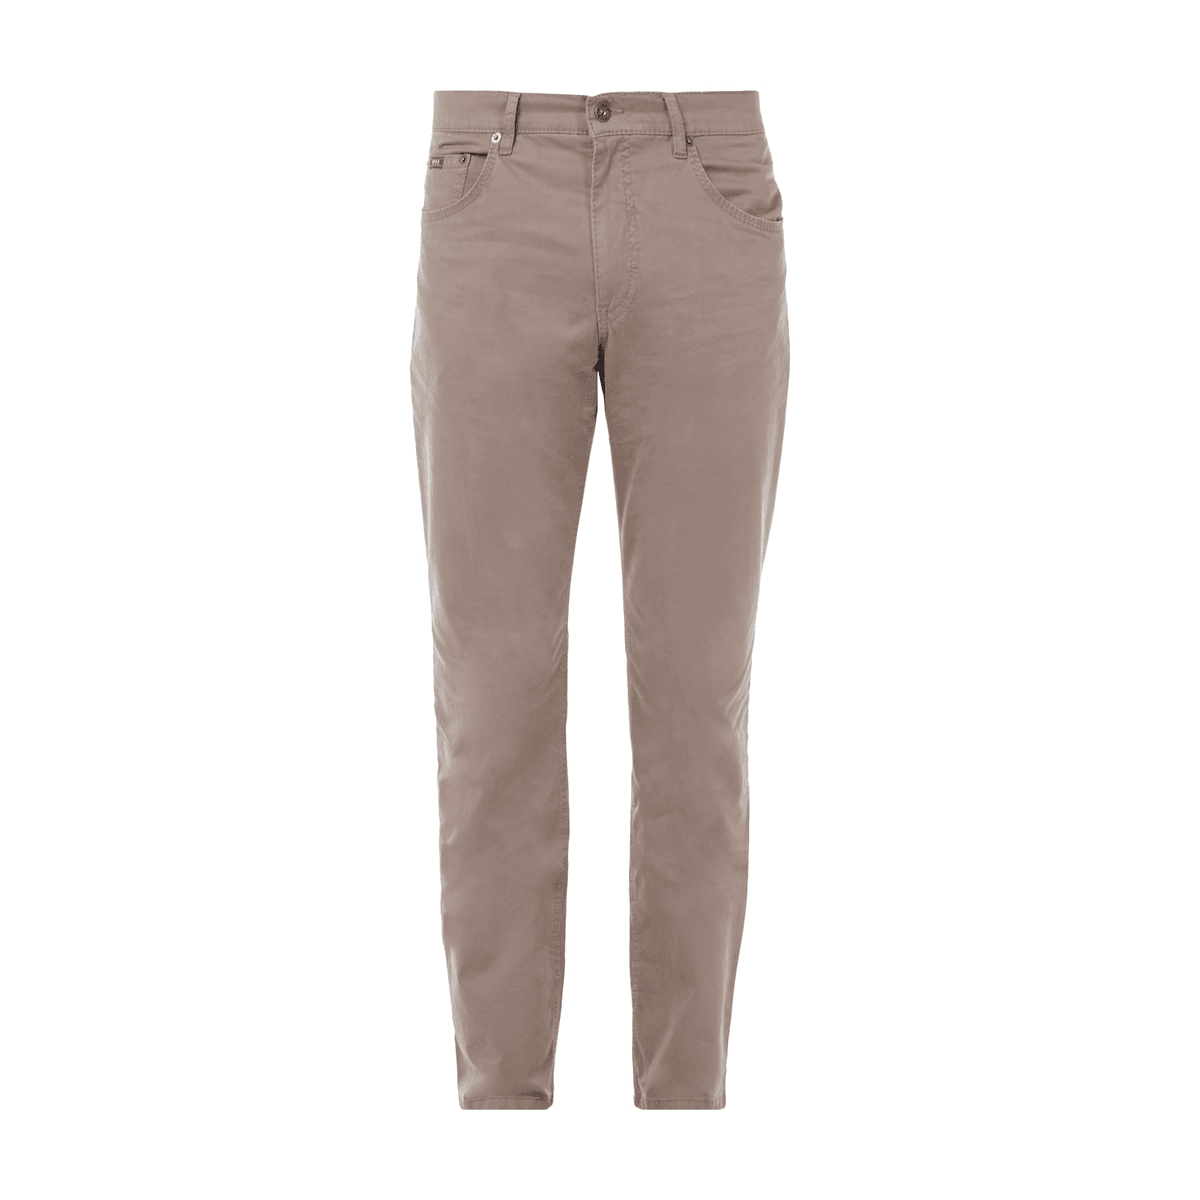 Brax Regular Fit 5-Pocket-Hose mit Stretch-Anteil Hose NEU